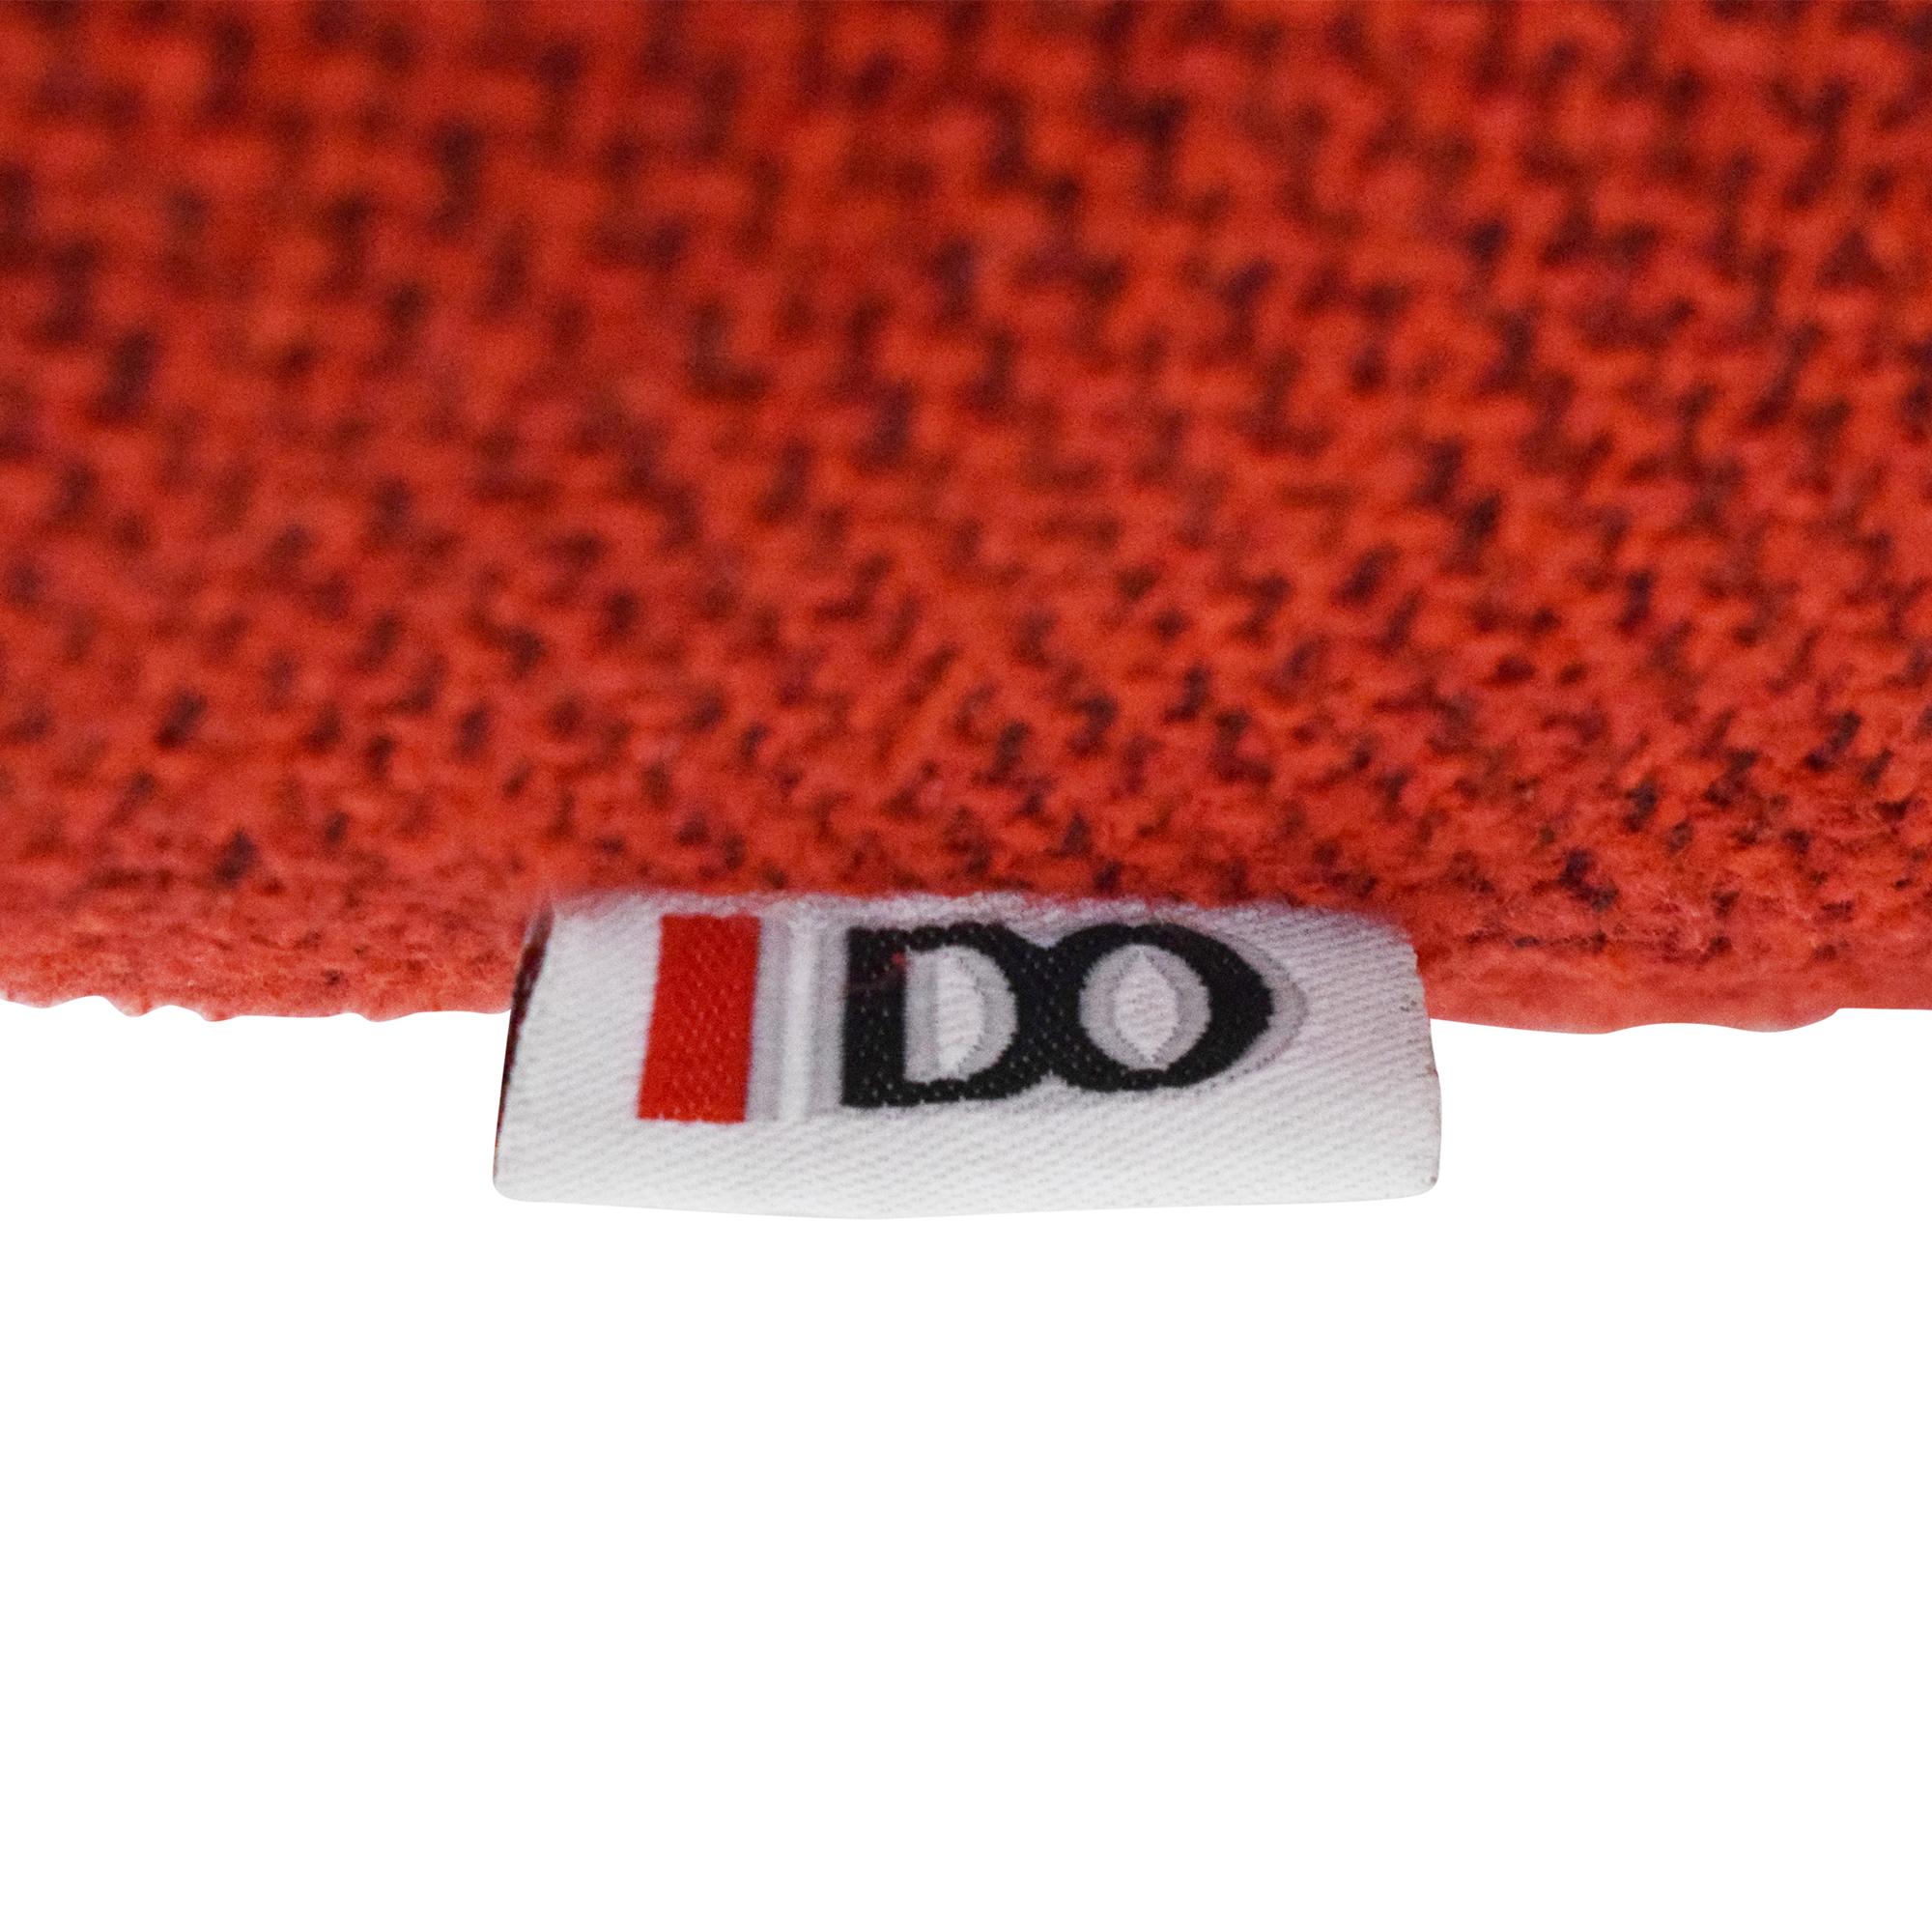 IDO IDO Swivel Convertible Sofa Bed on sale